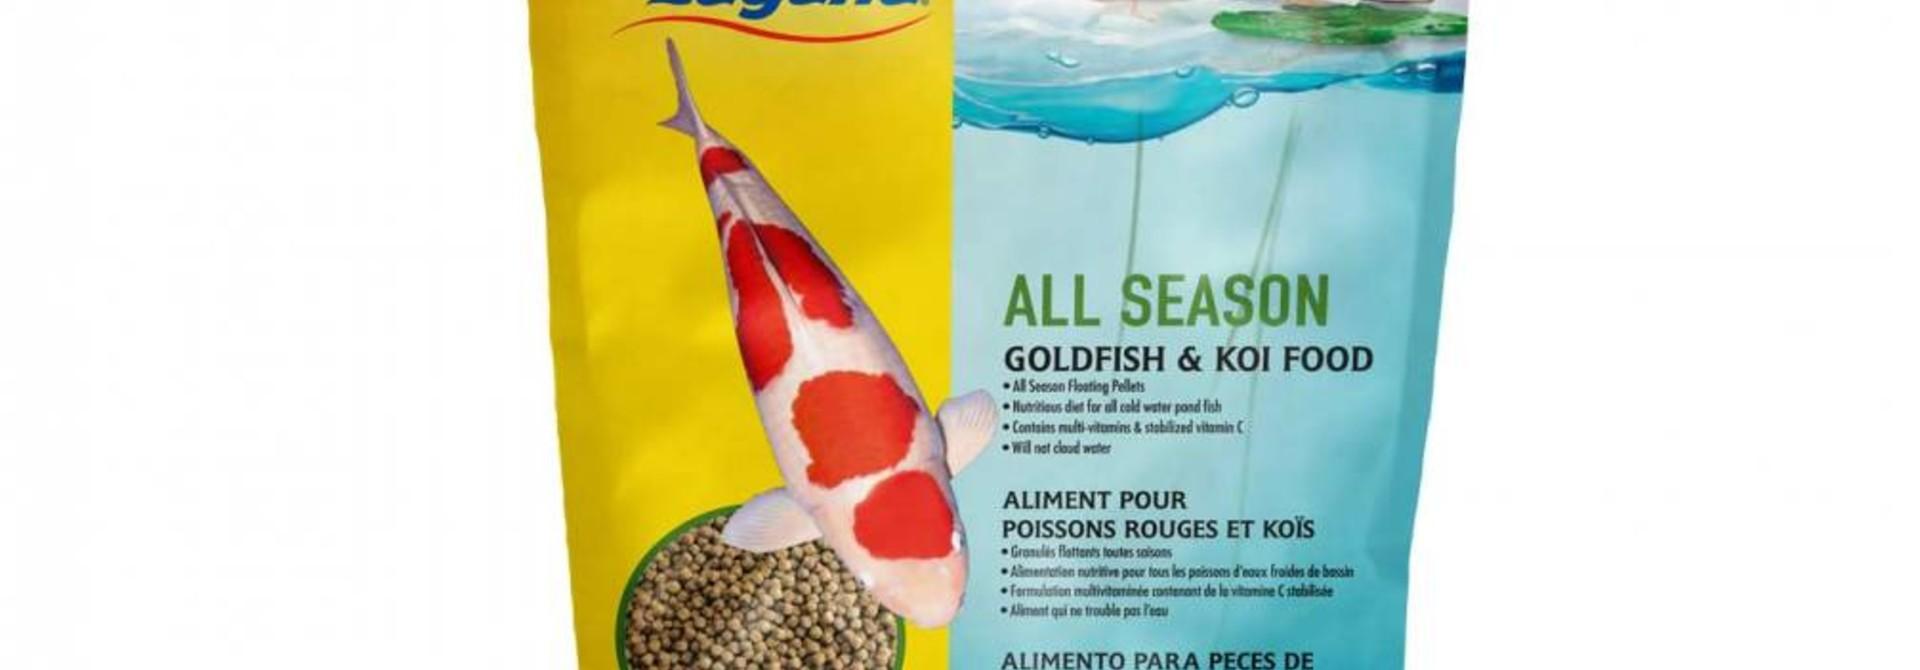 All Season Goldfish / Koi Floating Food 17 oz.